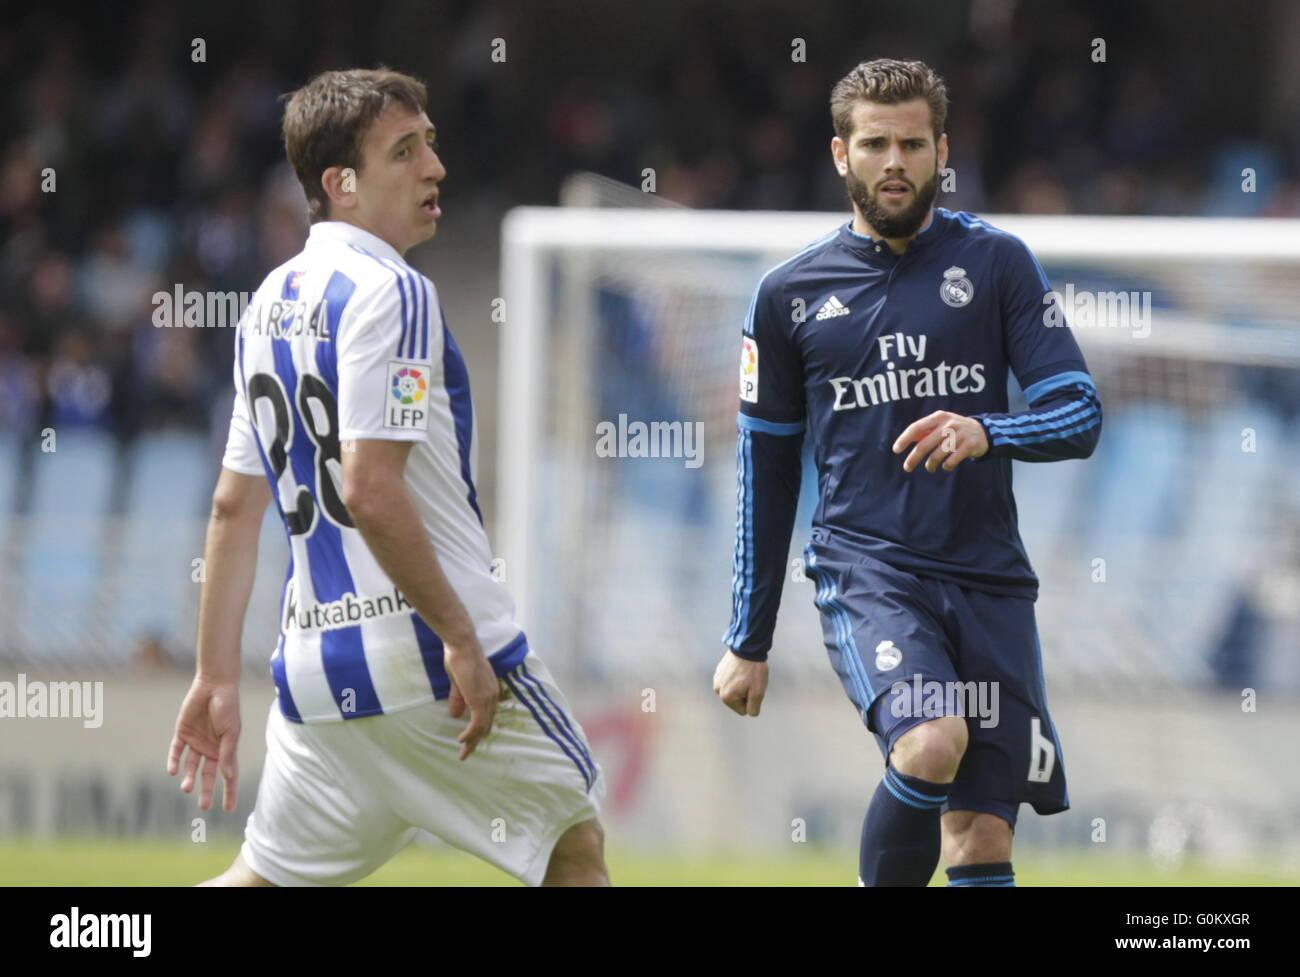 Nacho of Real Madrid during the La Liga match espagolde Real Sociedad - Real Madrid at the Anoeta Stadium - Stock Image